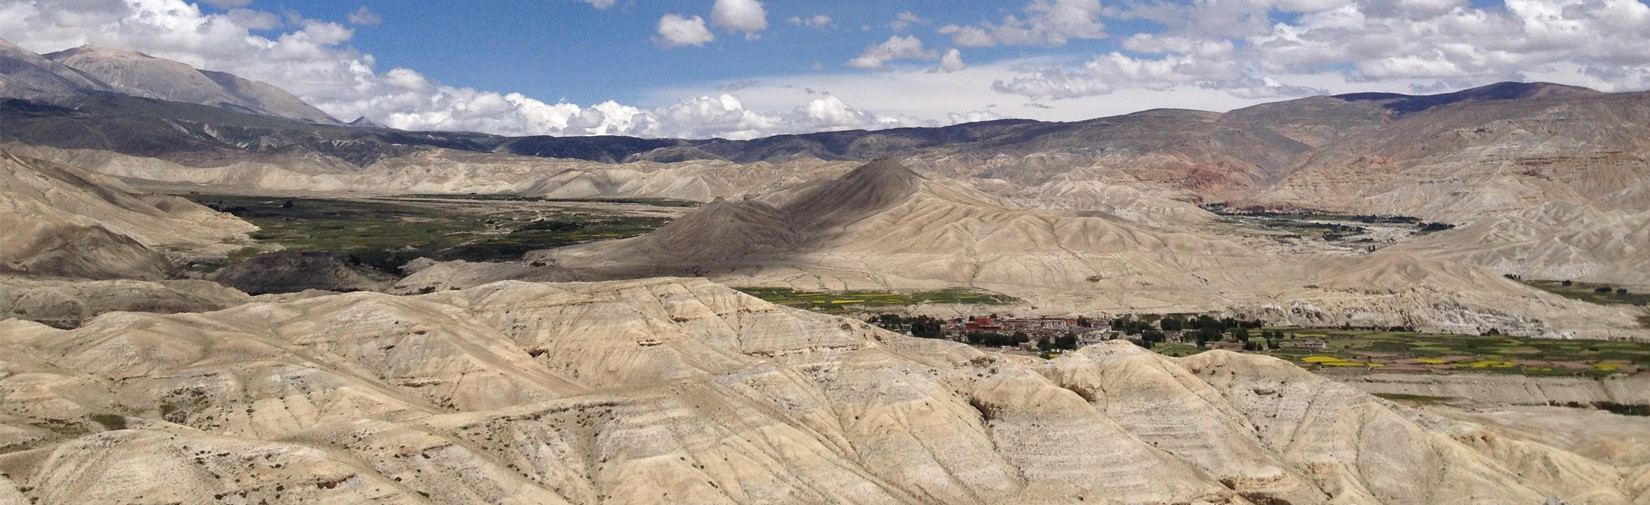 upper mustang landscape contrast